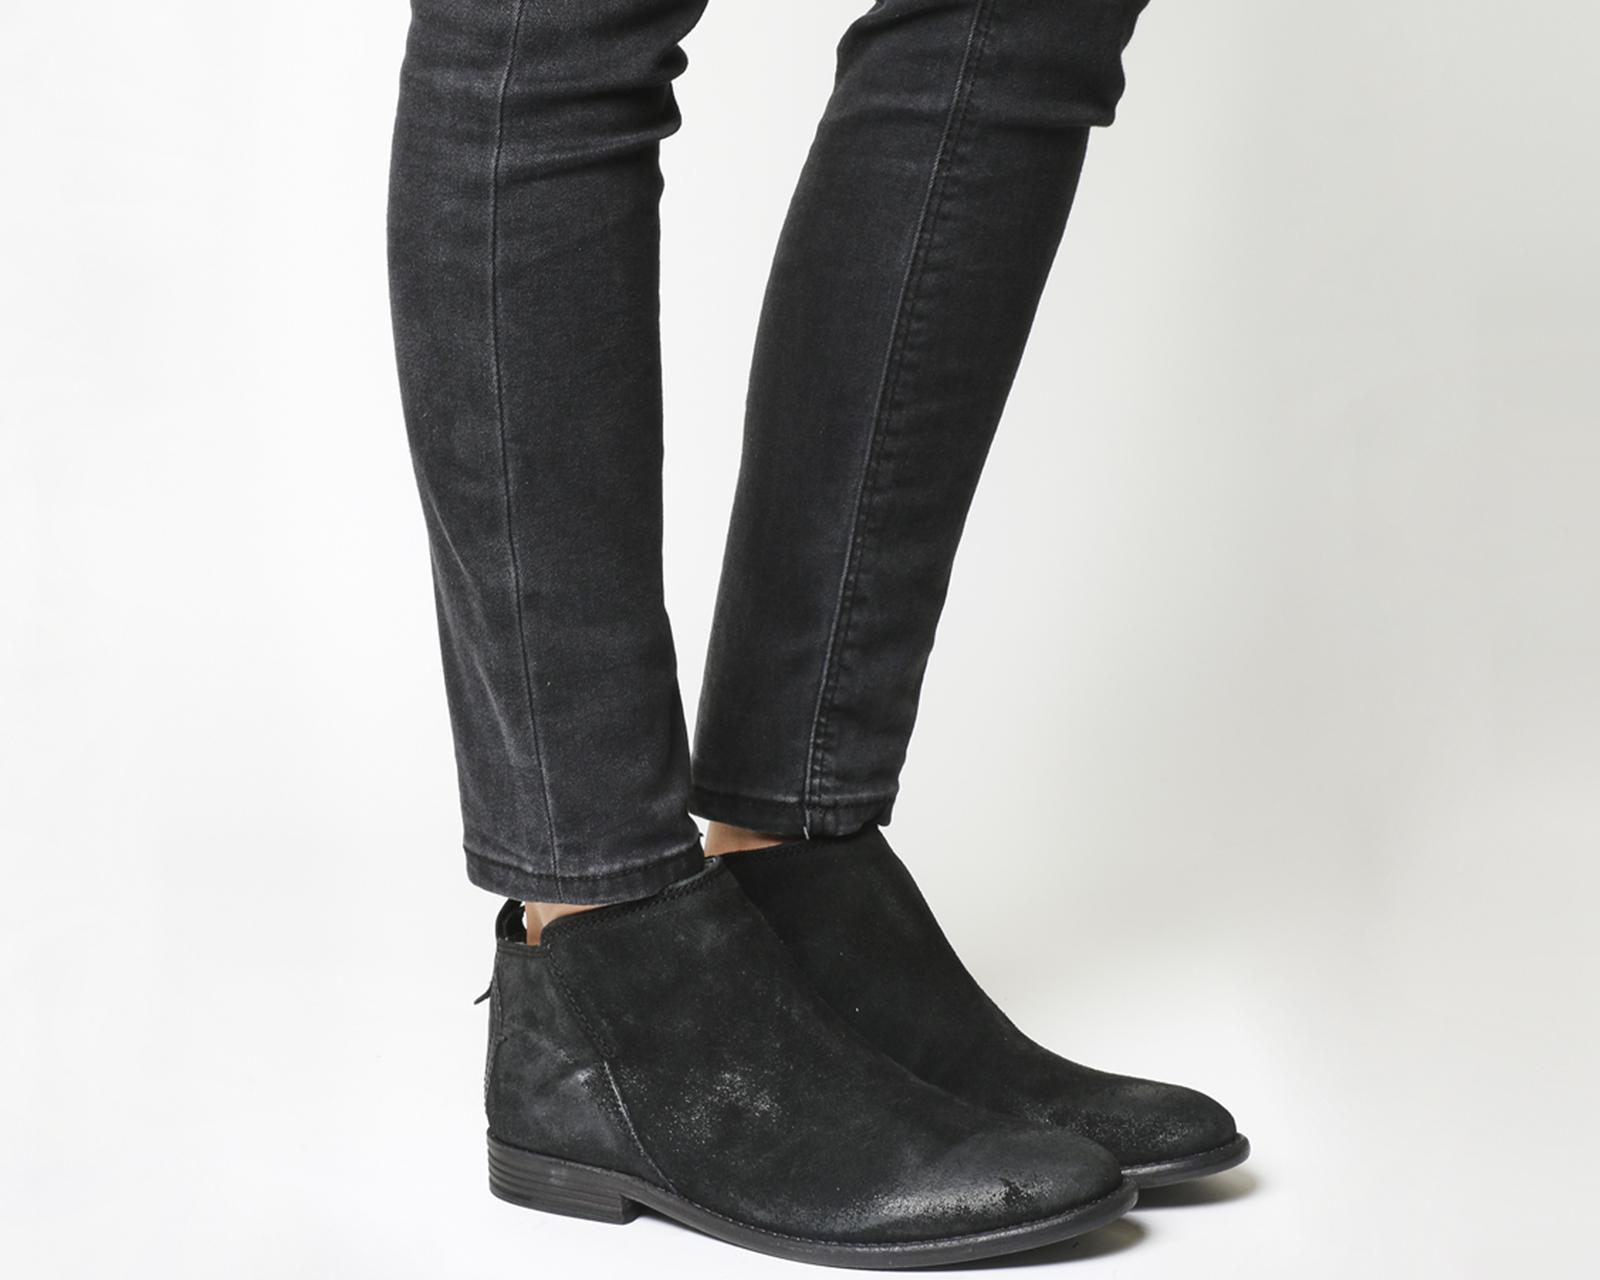 d0518daae95 H by Hudson Black Revelin Boots